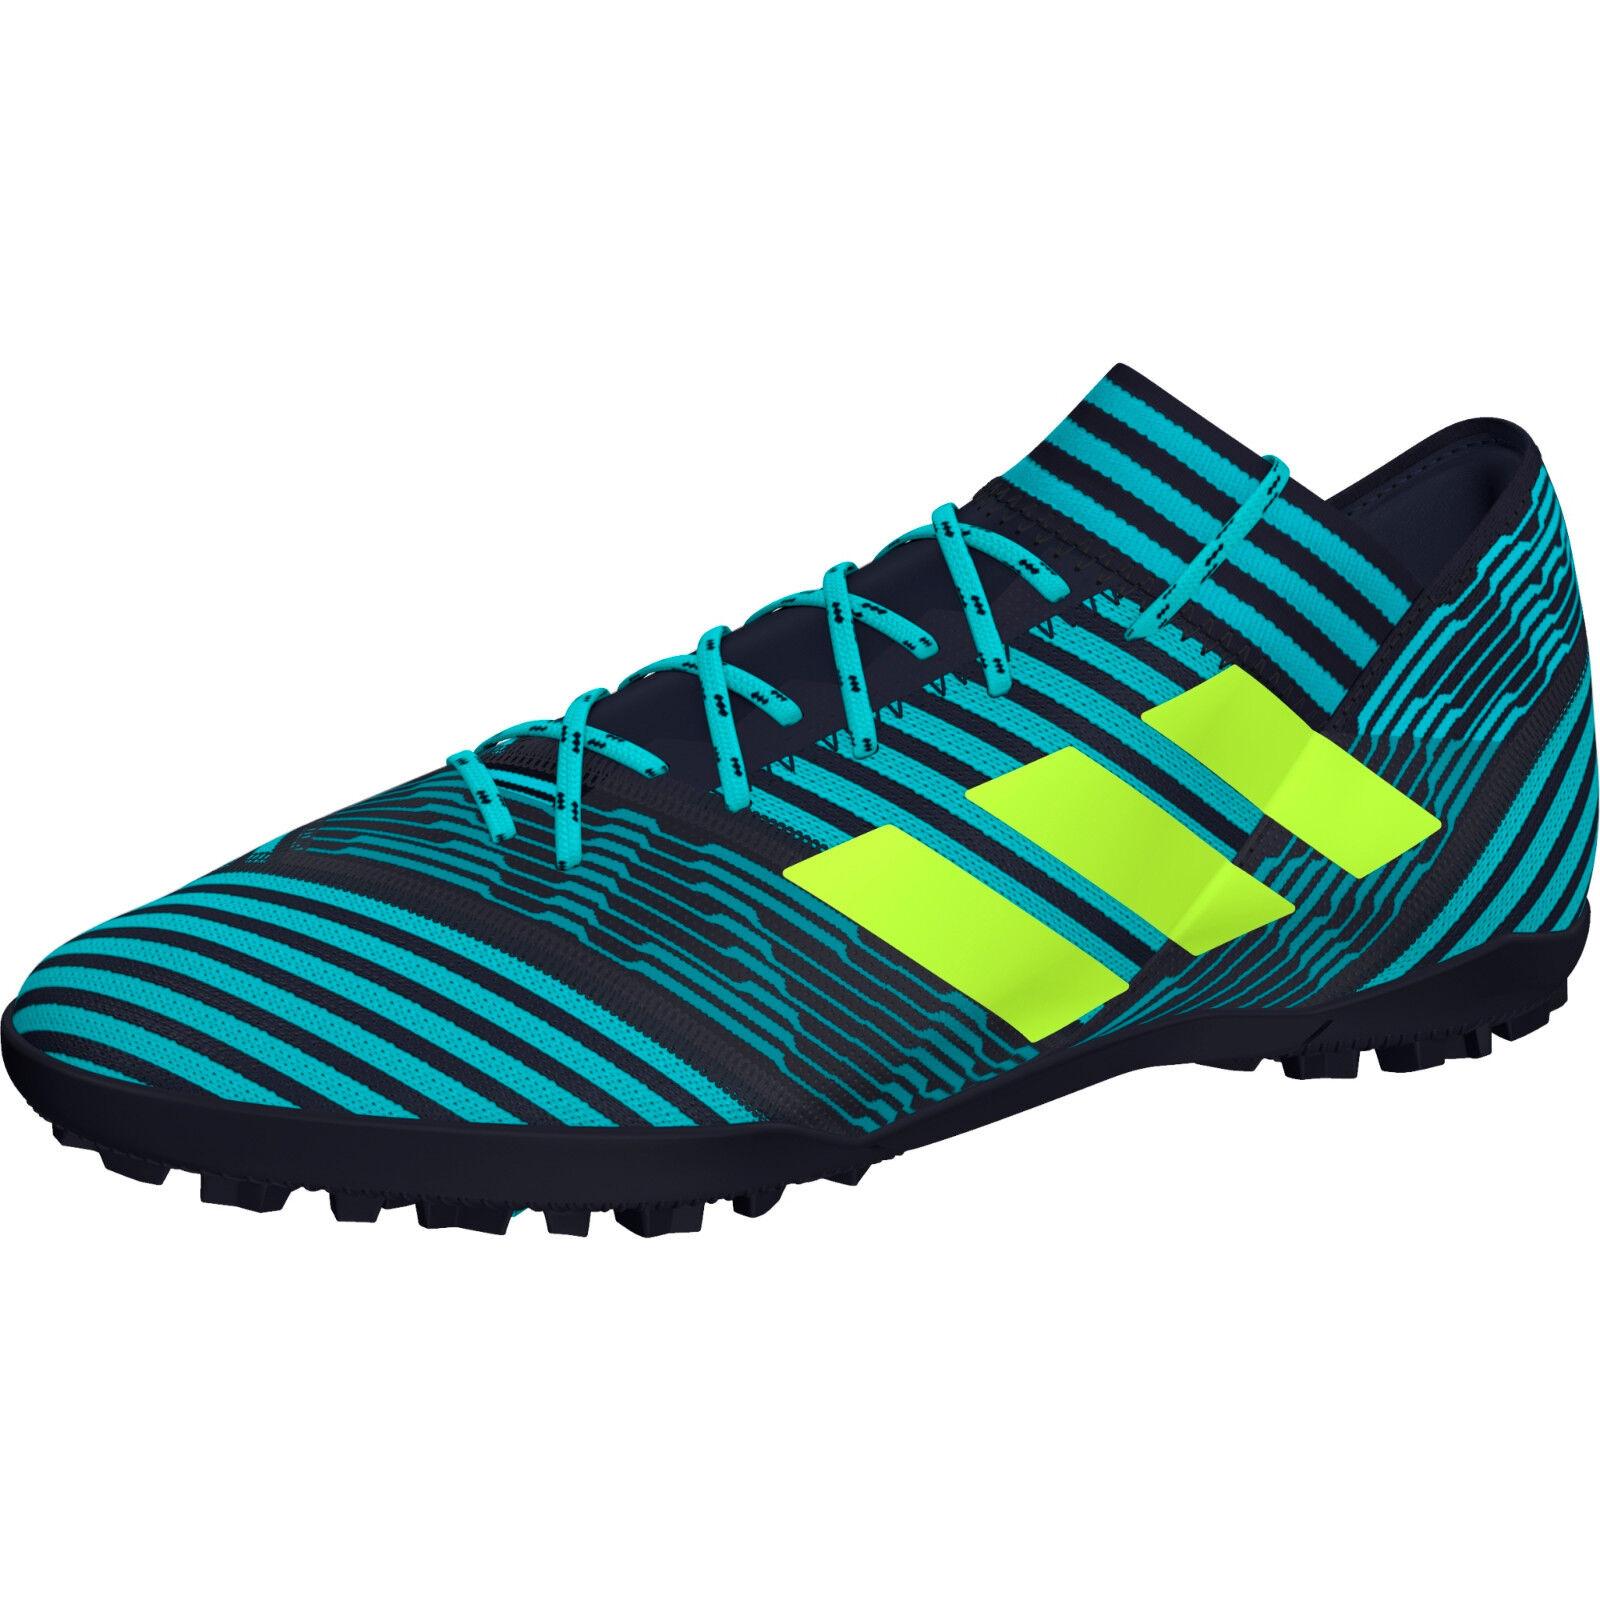 Adidas NEMEZIZ TANGO 17 TF BY2463 scarpa CALCIO CALCETTO Col. Blu legend ink NEW